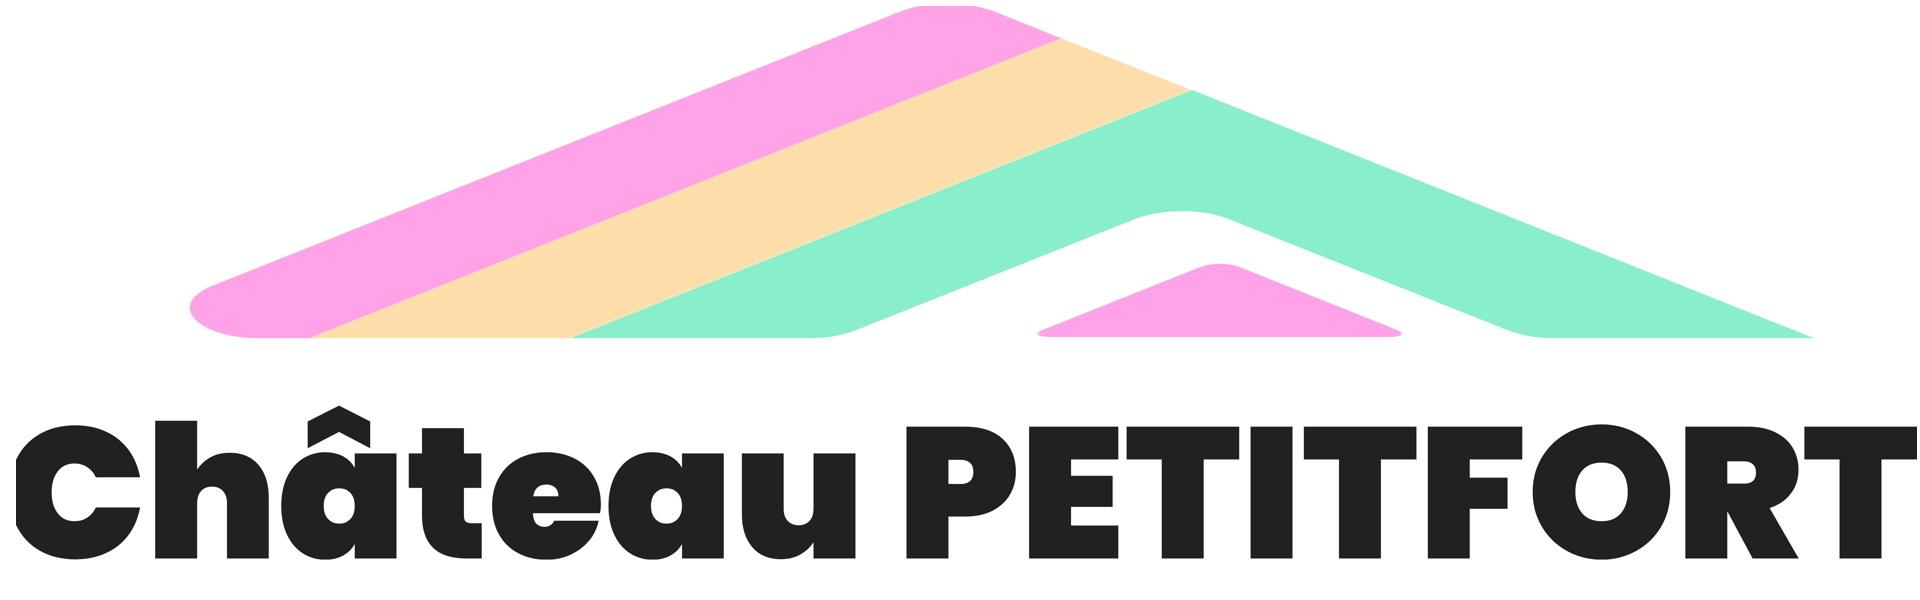 PANORAMIQUE logo 1920X600